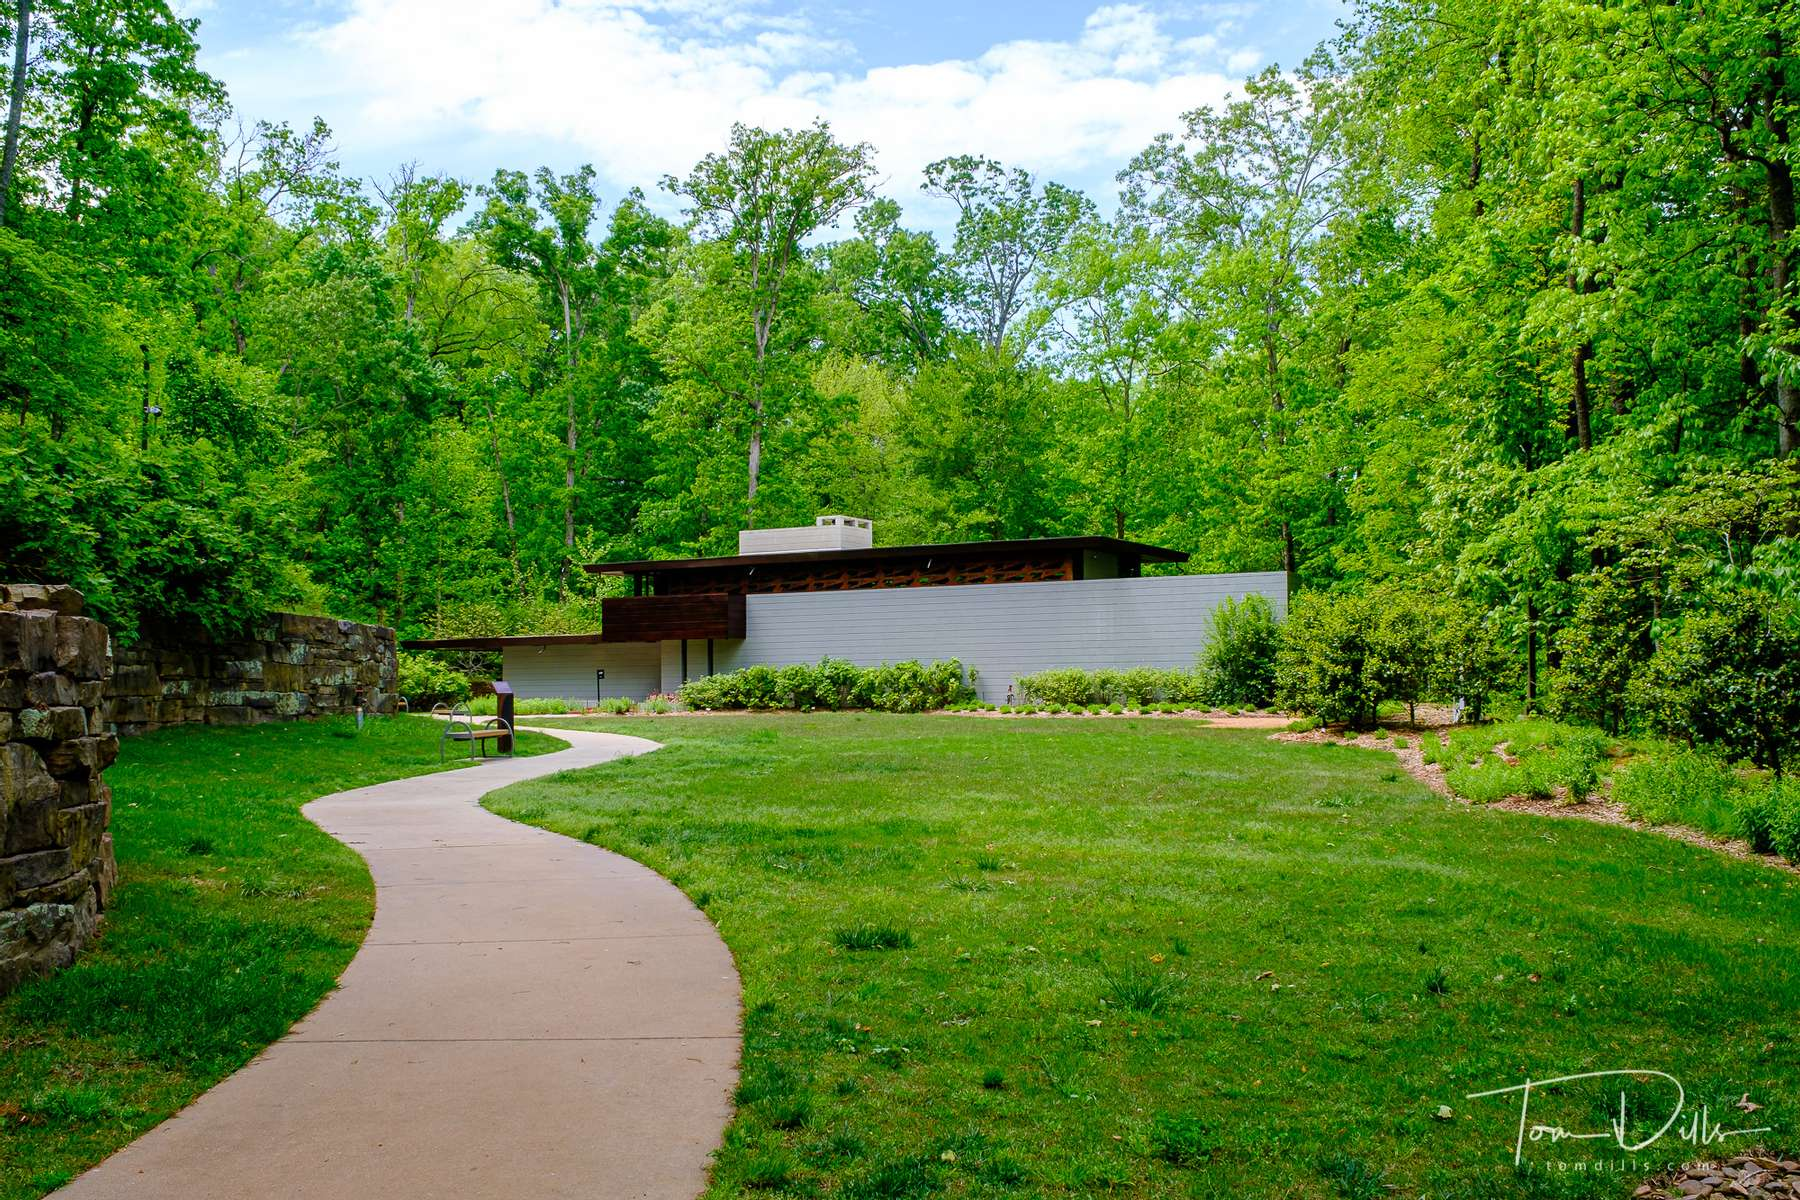 Frank Lloyd Wright's Bachman-Wilson House at The Crystal Bridges Museum of American Art in Bentonville, Arkansas